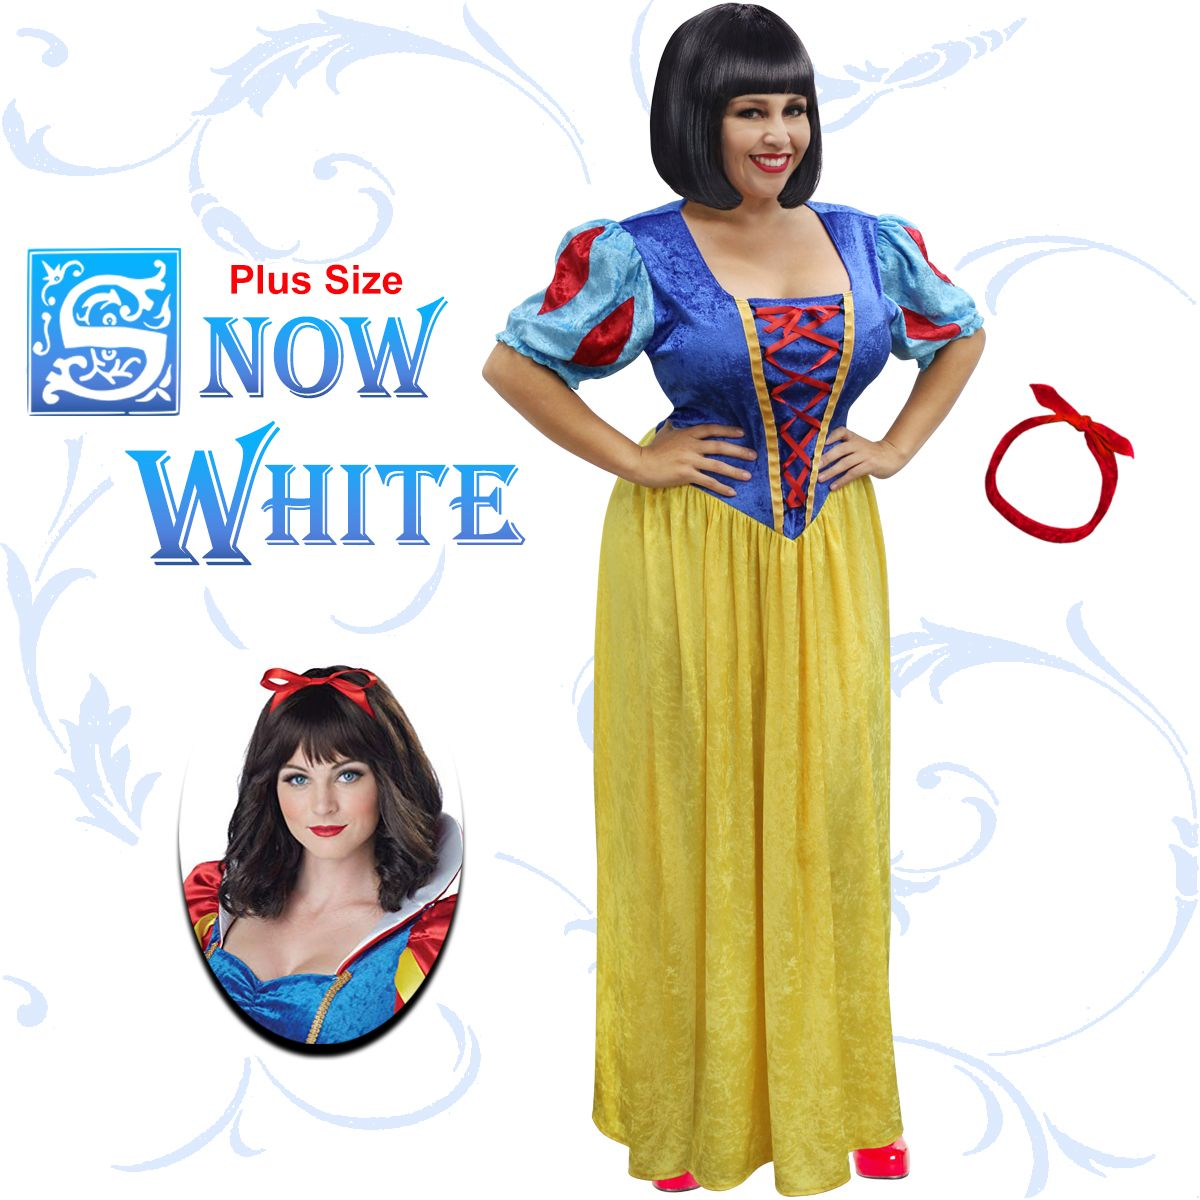 NEW! Plus Size Snow White Halloween Costume Lg XL 1x 2x 3x